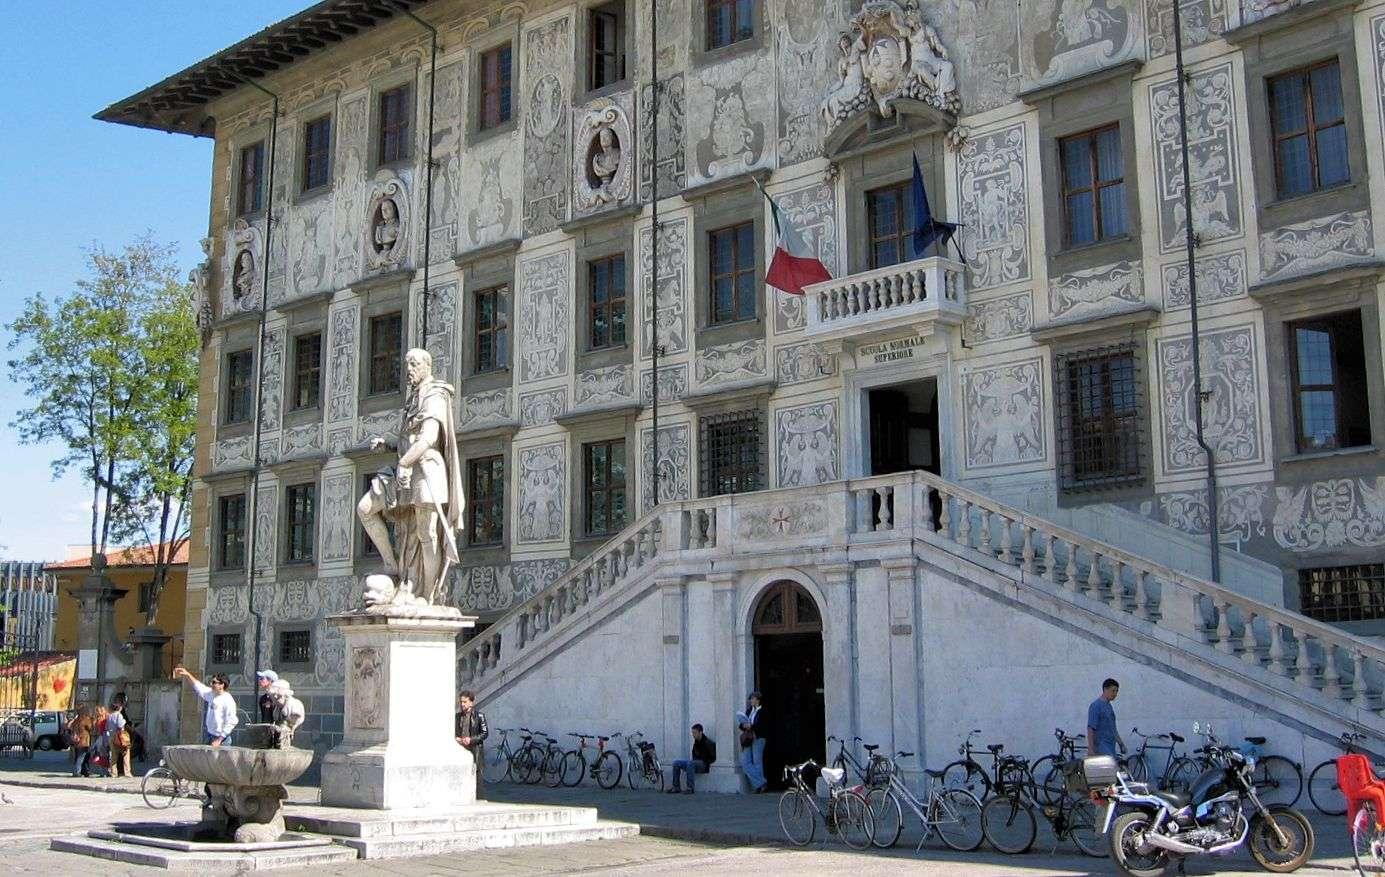 Piazza dei Cavalieri i Pisa